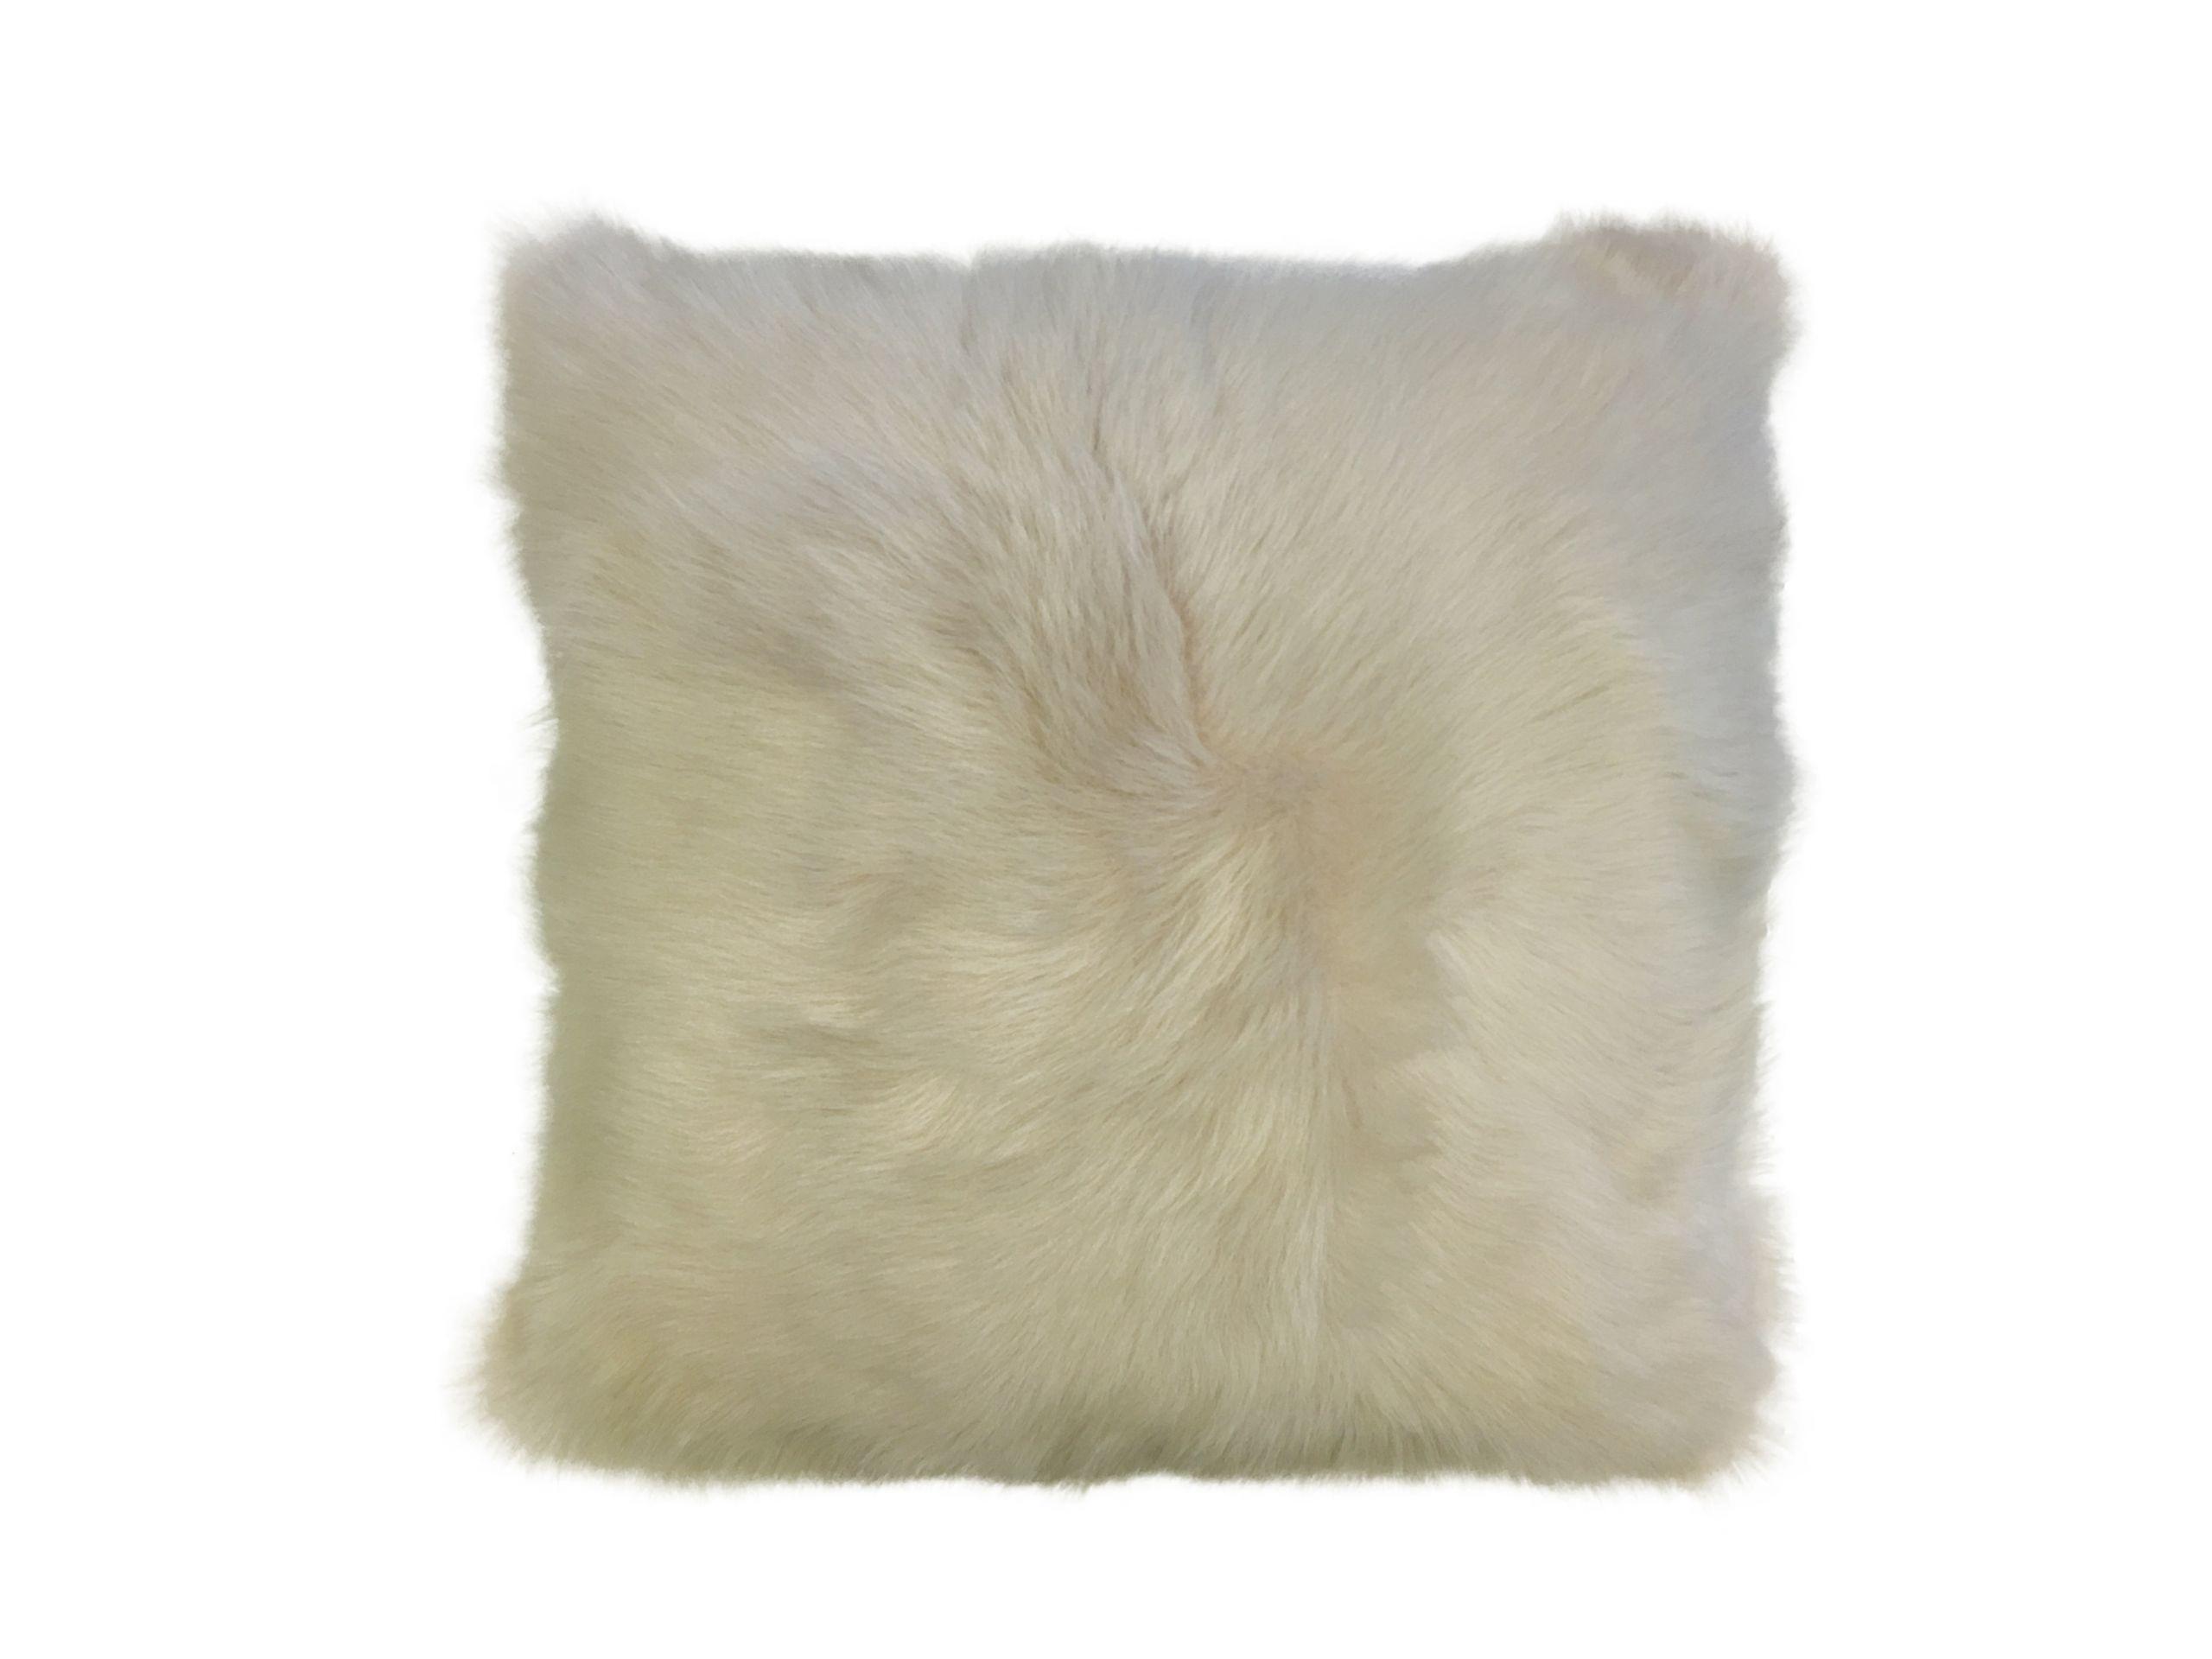 Shearling Pillow-Tortura-50x50cm-SPTORS2545050 - ANVOGG FEEL SHEARLING | ANVOGG